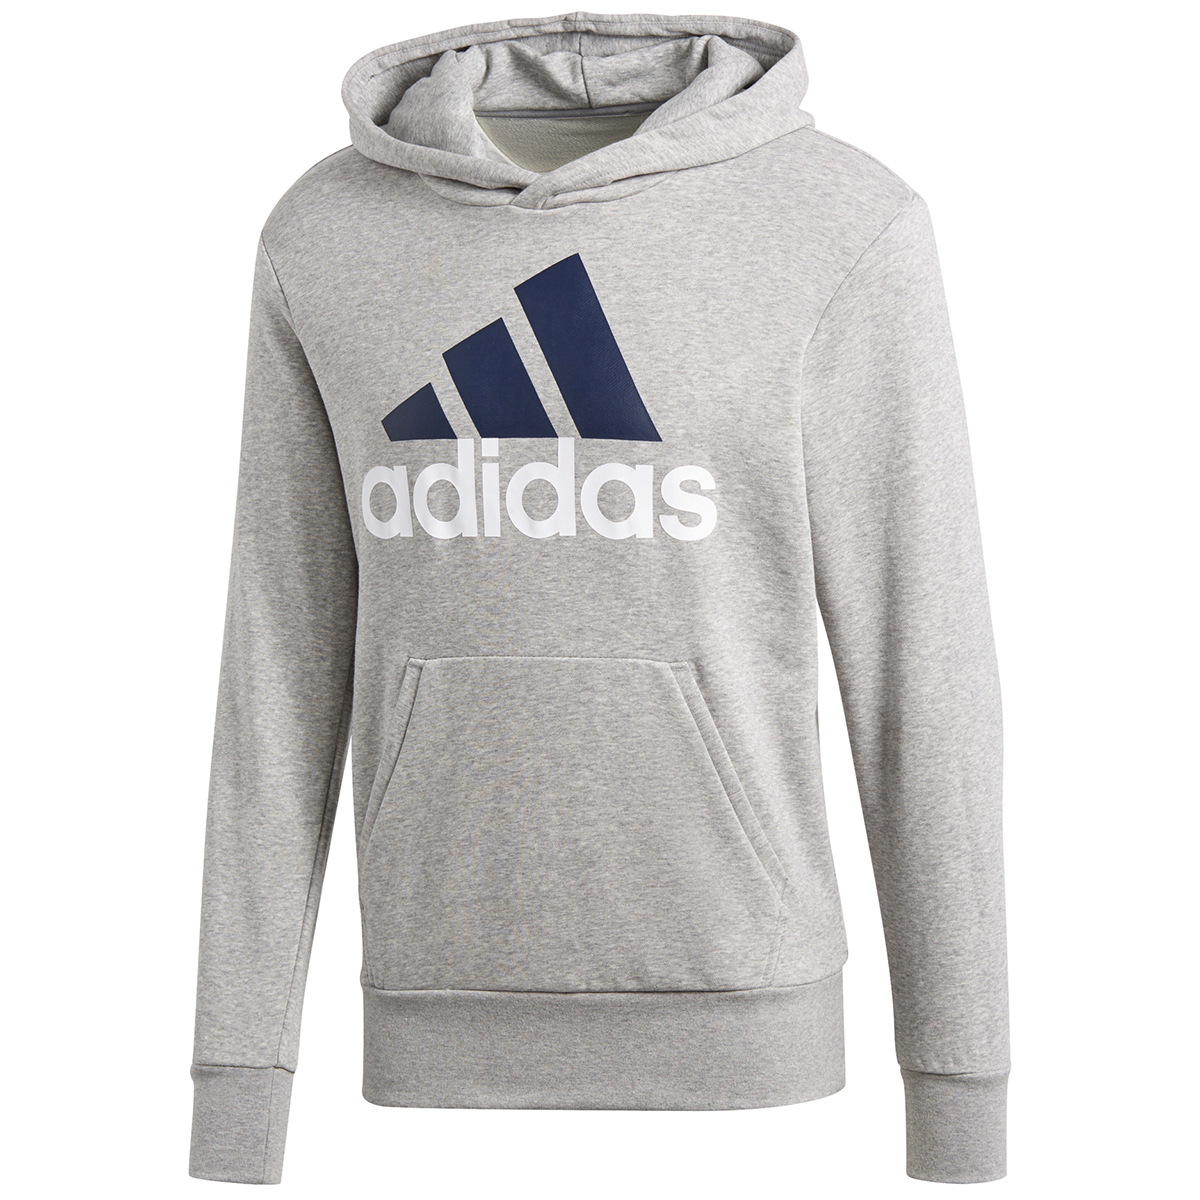 Adidas Men's Essentials Linear Pullover Hoodie - Black, XL